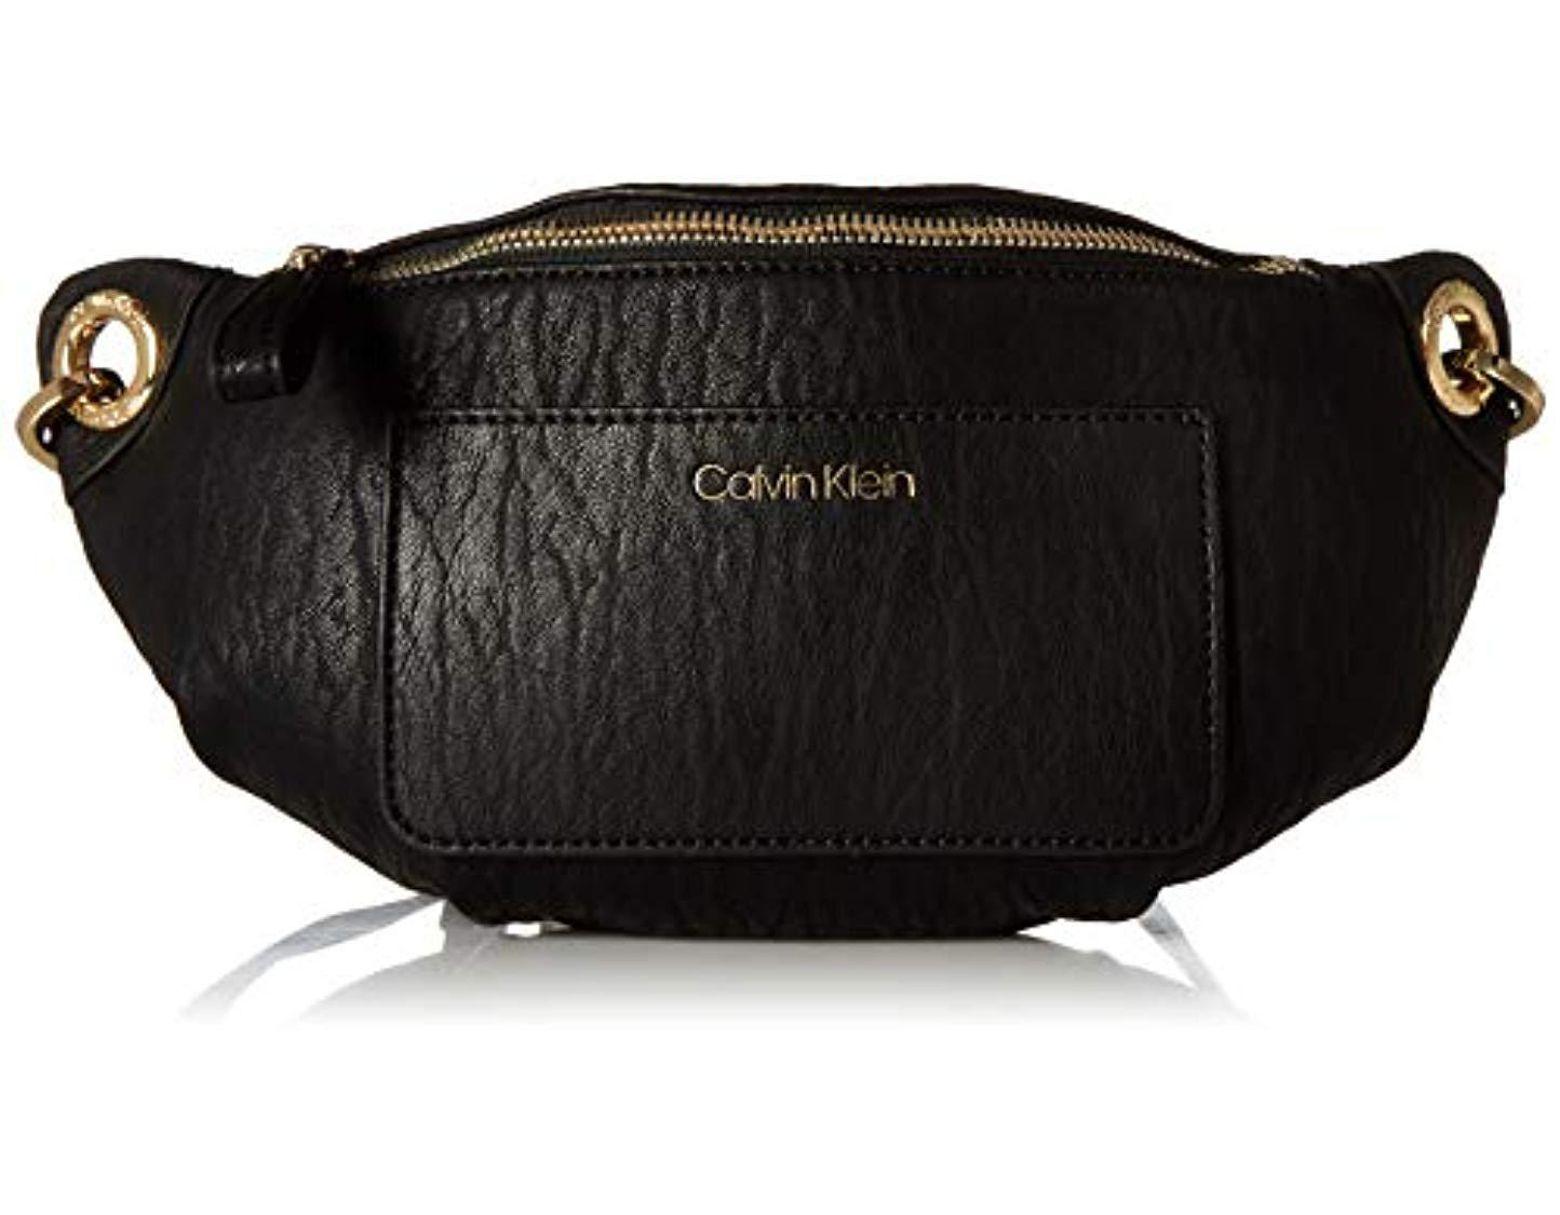 288fa1d460b Calvin Klein Sonoma Bubble Lamb Novelty Key Item Fanny Pack Belt Bag in  Black - Lyst